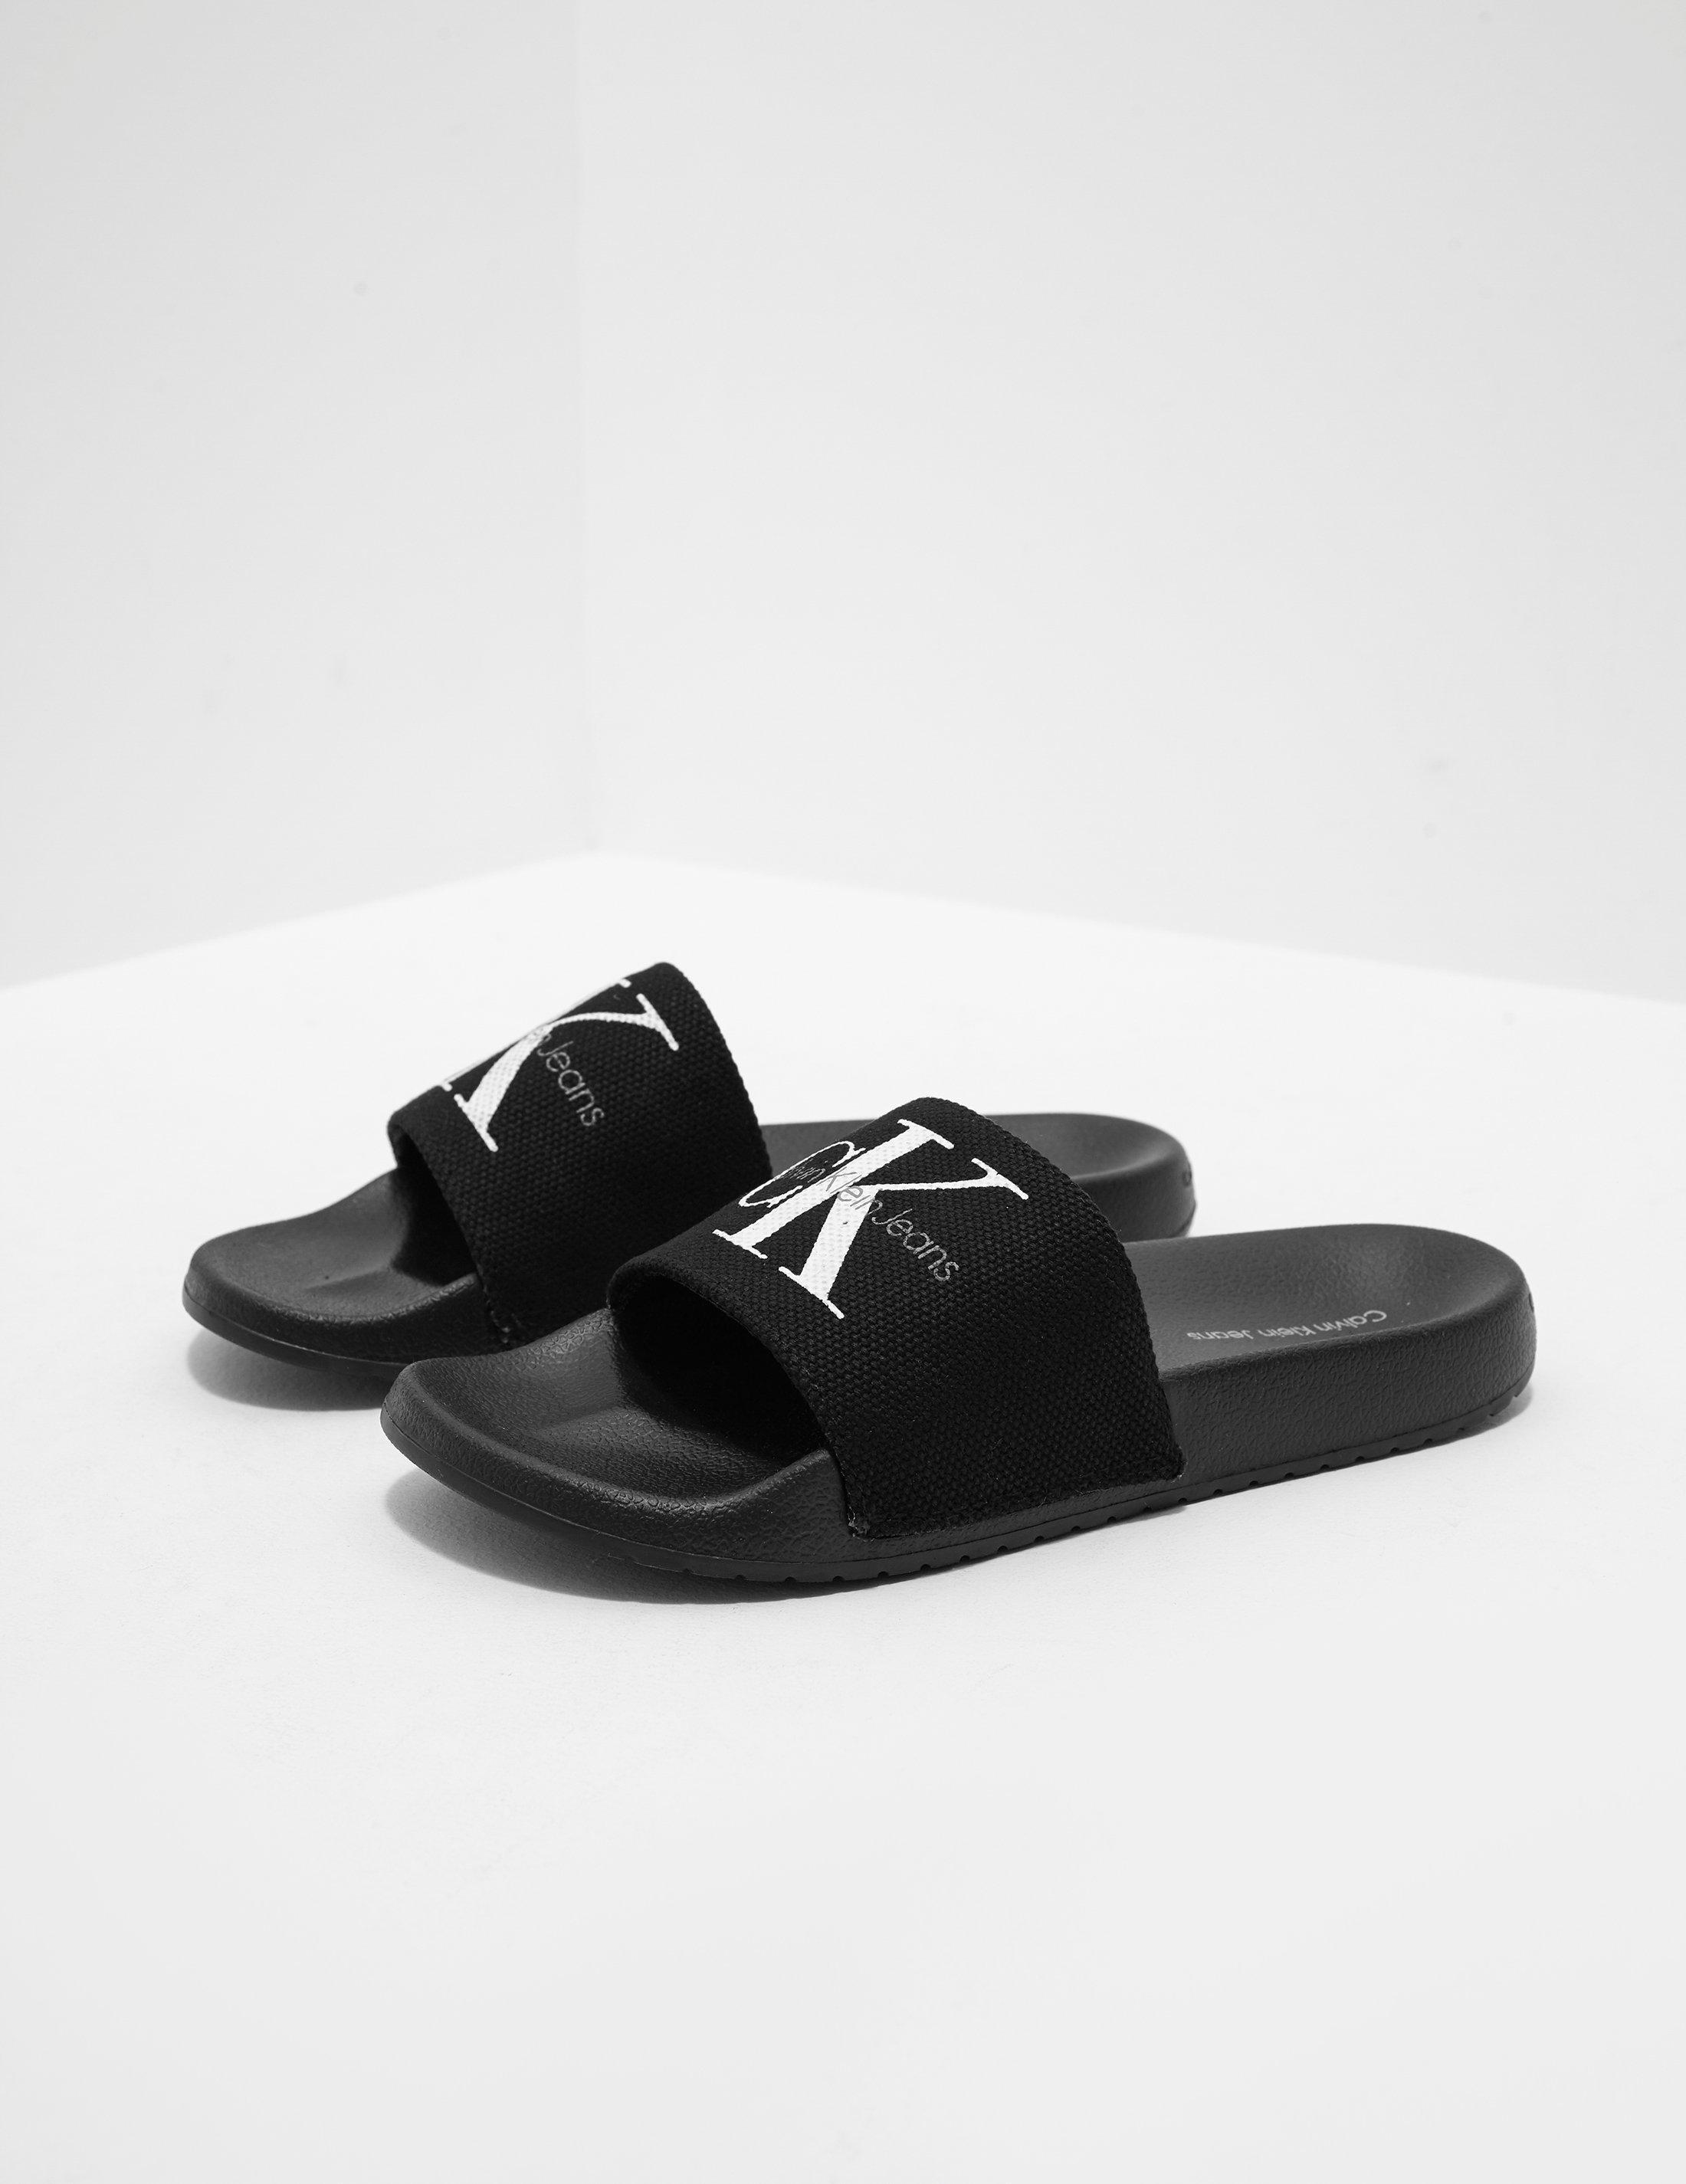 ecc3bd1b718a Lyst - Calvin Klein Chantal Slides Women s Black in Black - Save 5%